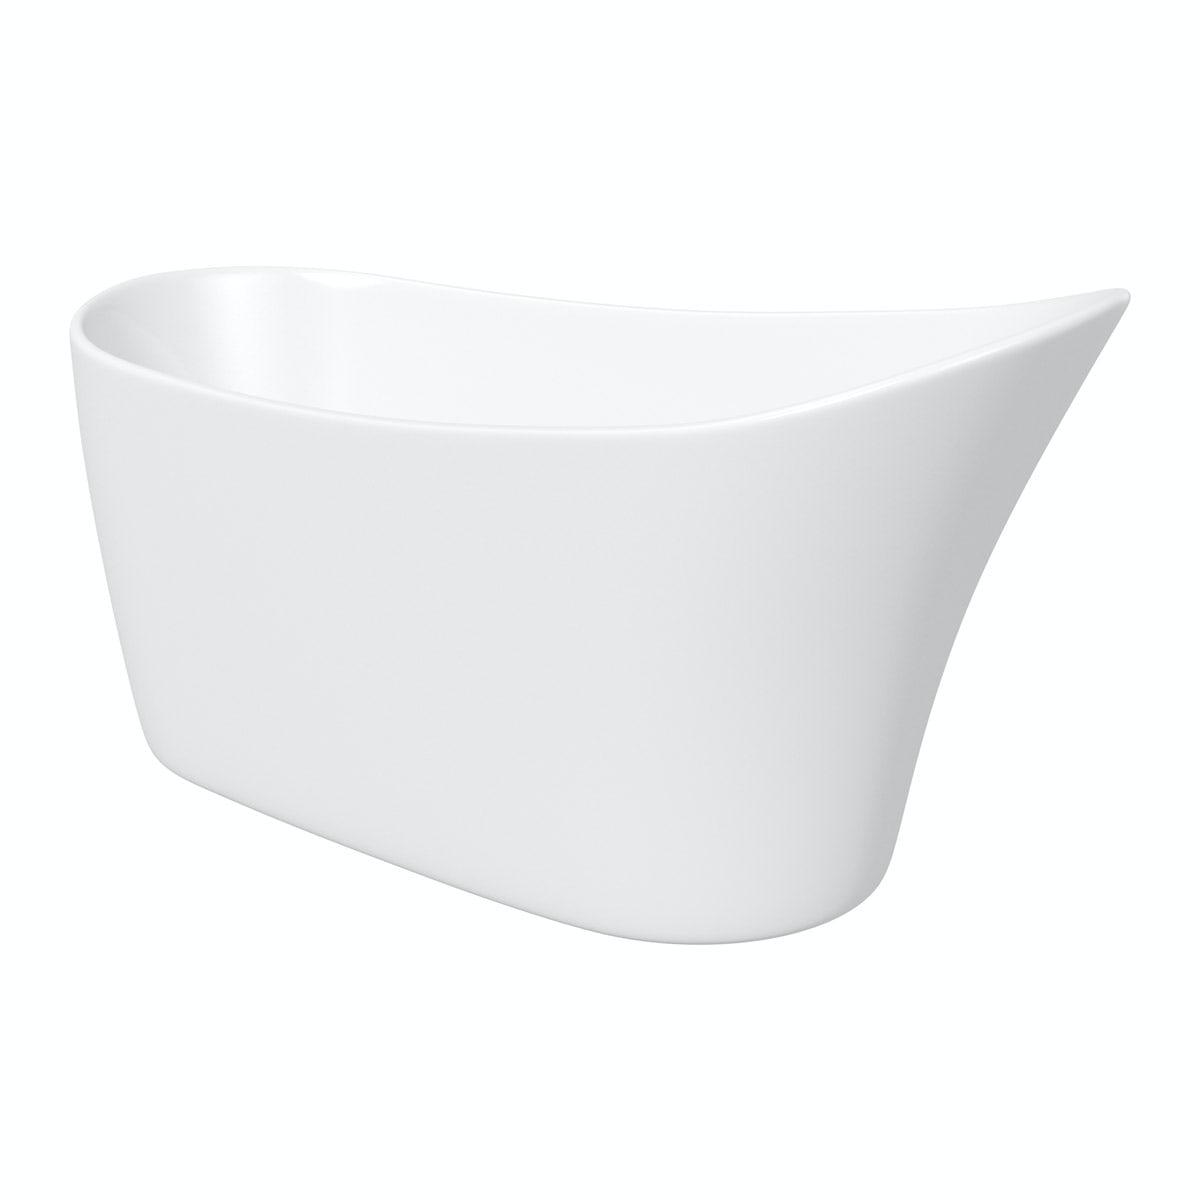 Mode Hardy freestanding bath 1600 x 750